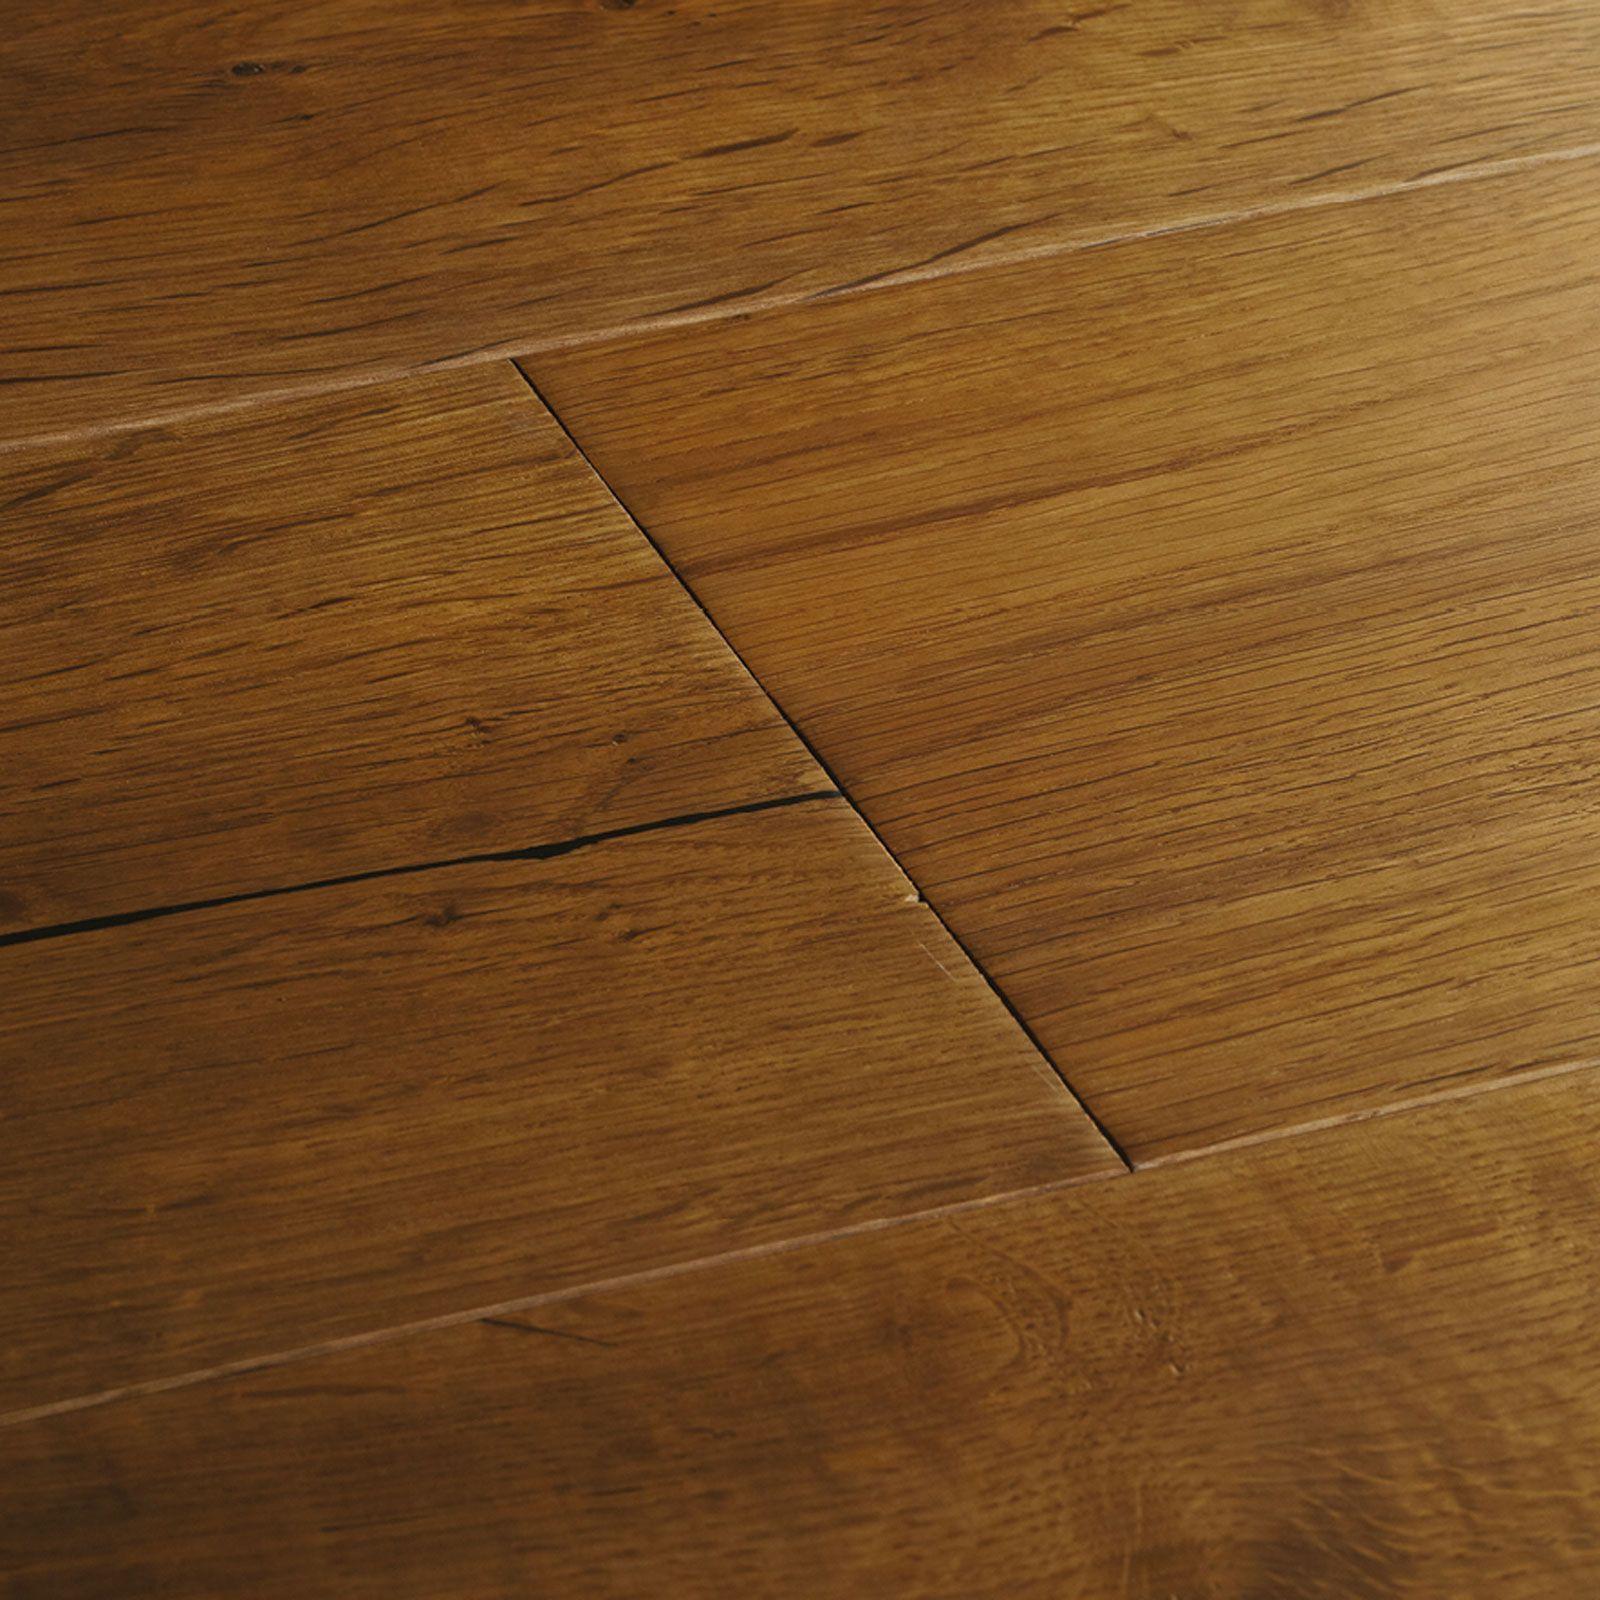 hardwood flooring vernon bc of red oak hardwood flooring oak meet special walnut floor plan ideas with red oak hardwood flooring 40 how thick is hardwood flooring concept